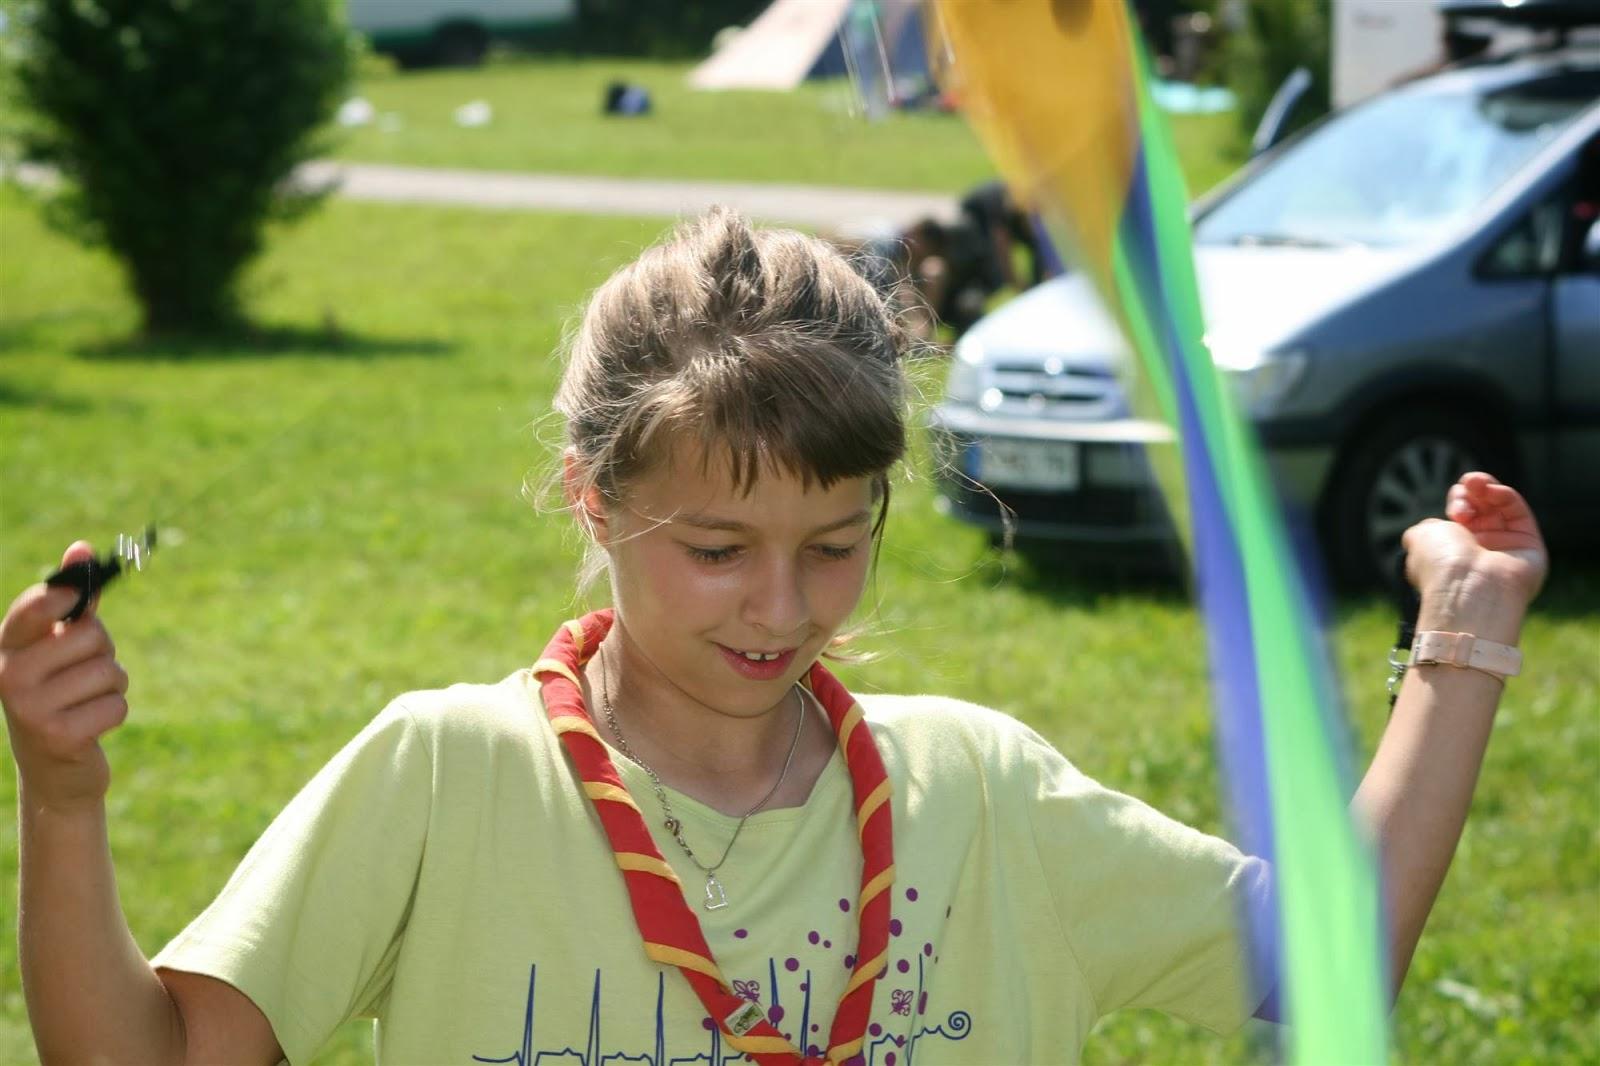 Državni mnogoboj, Velenje 2007 - IMG_8766.jpg